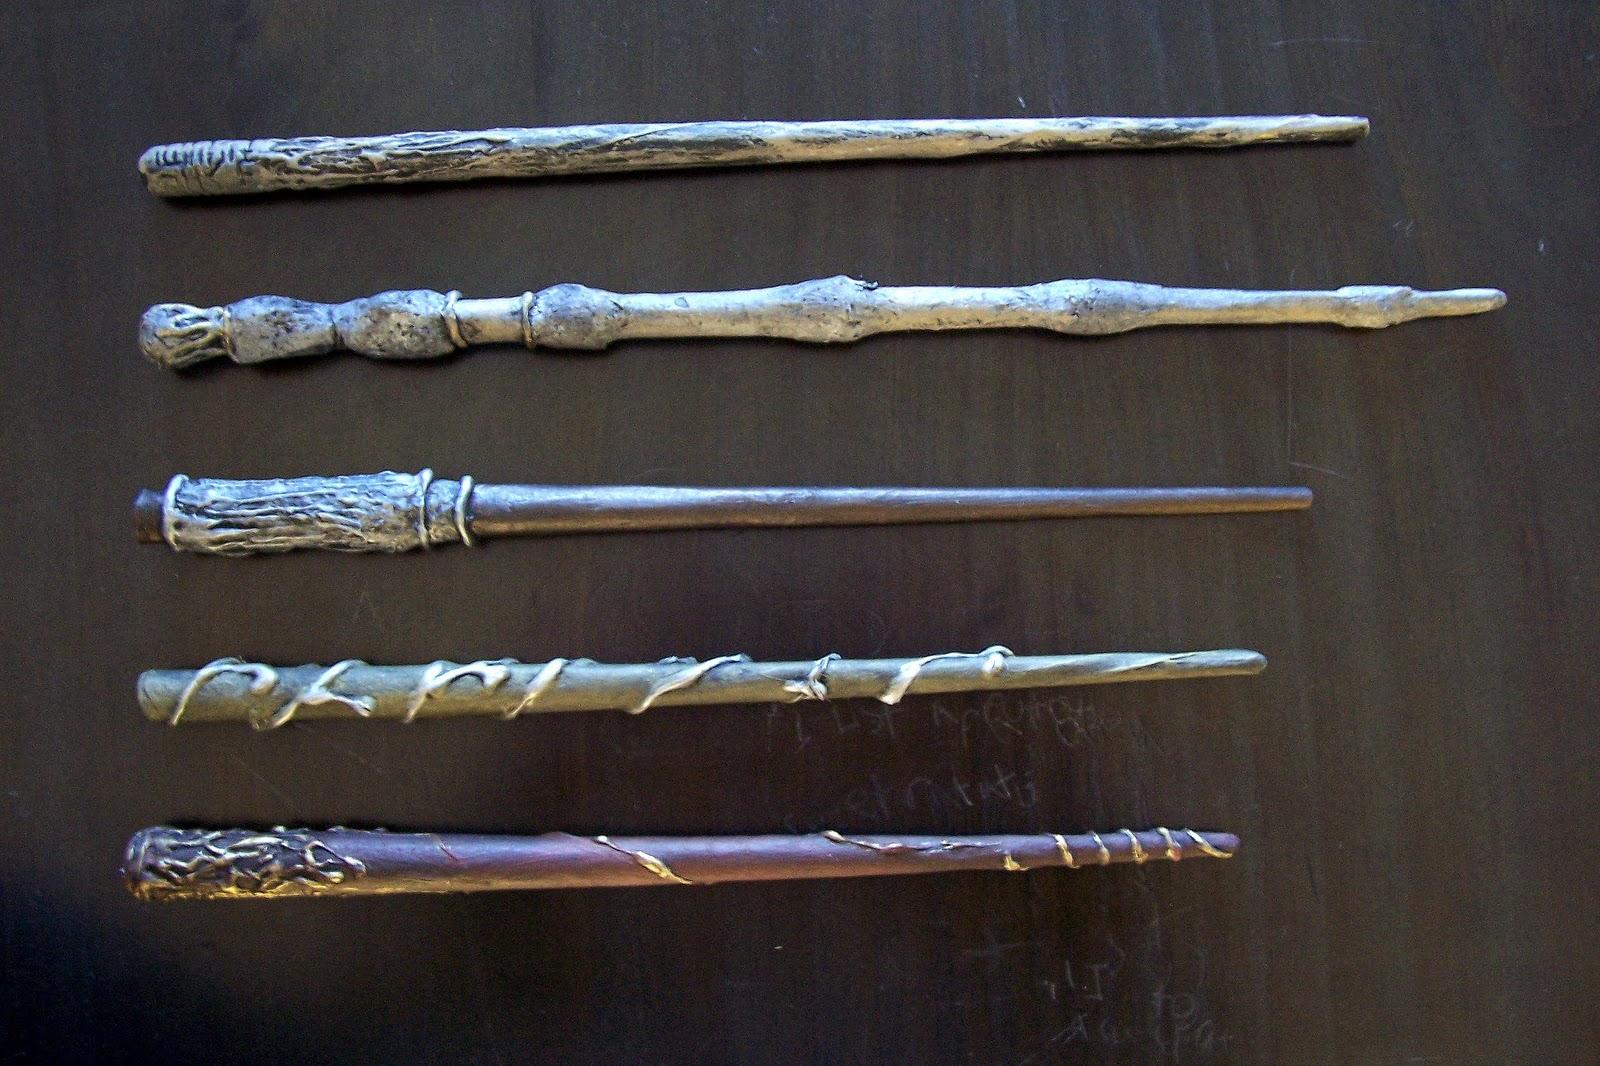 A million universes making magic for Light up elder wand